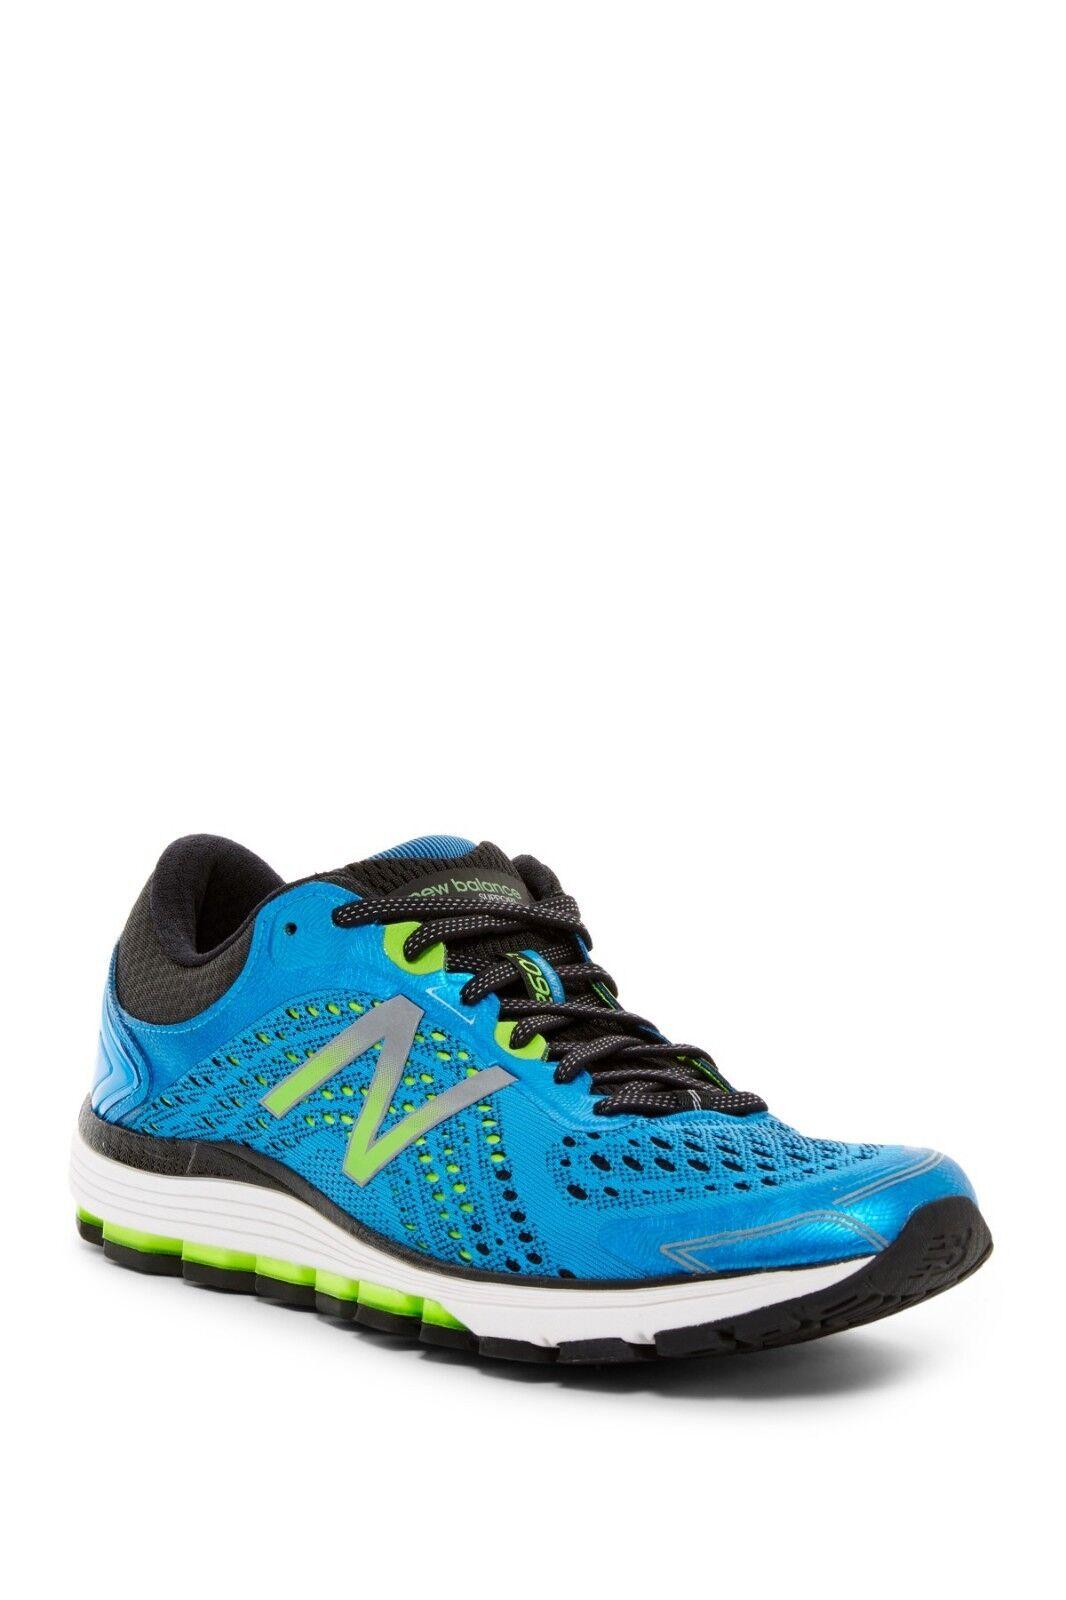 Men's New Balance Running shoes shoes shoes M1260BG7 - FREE SHIP  HOT ITEM  67425e